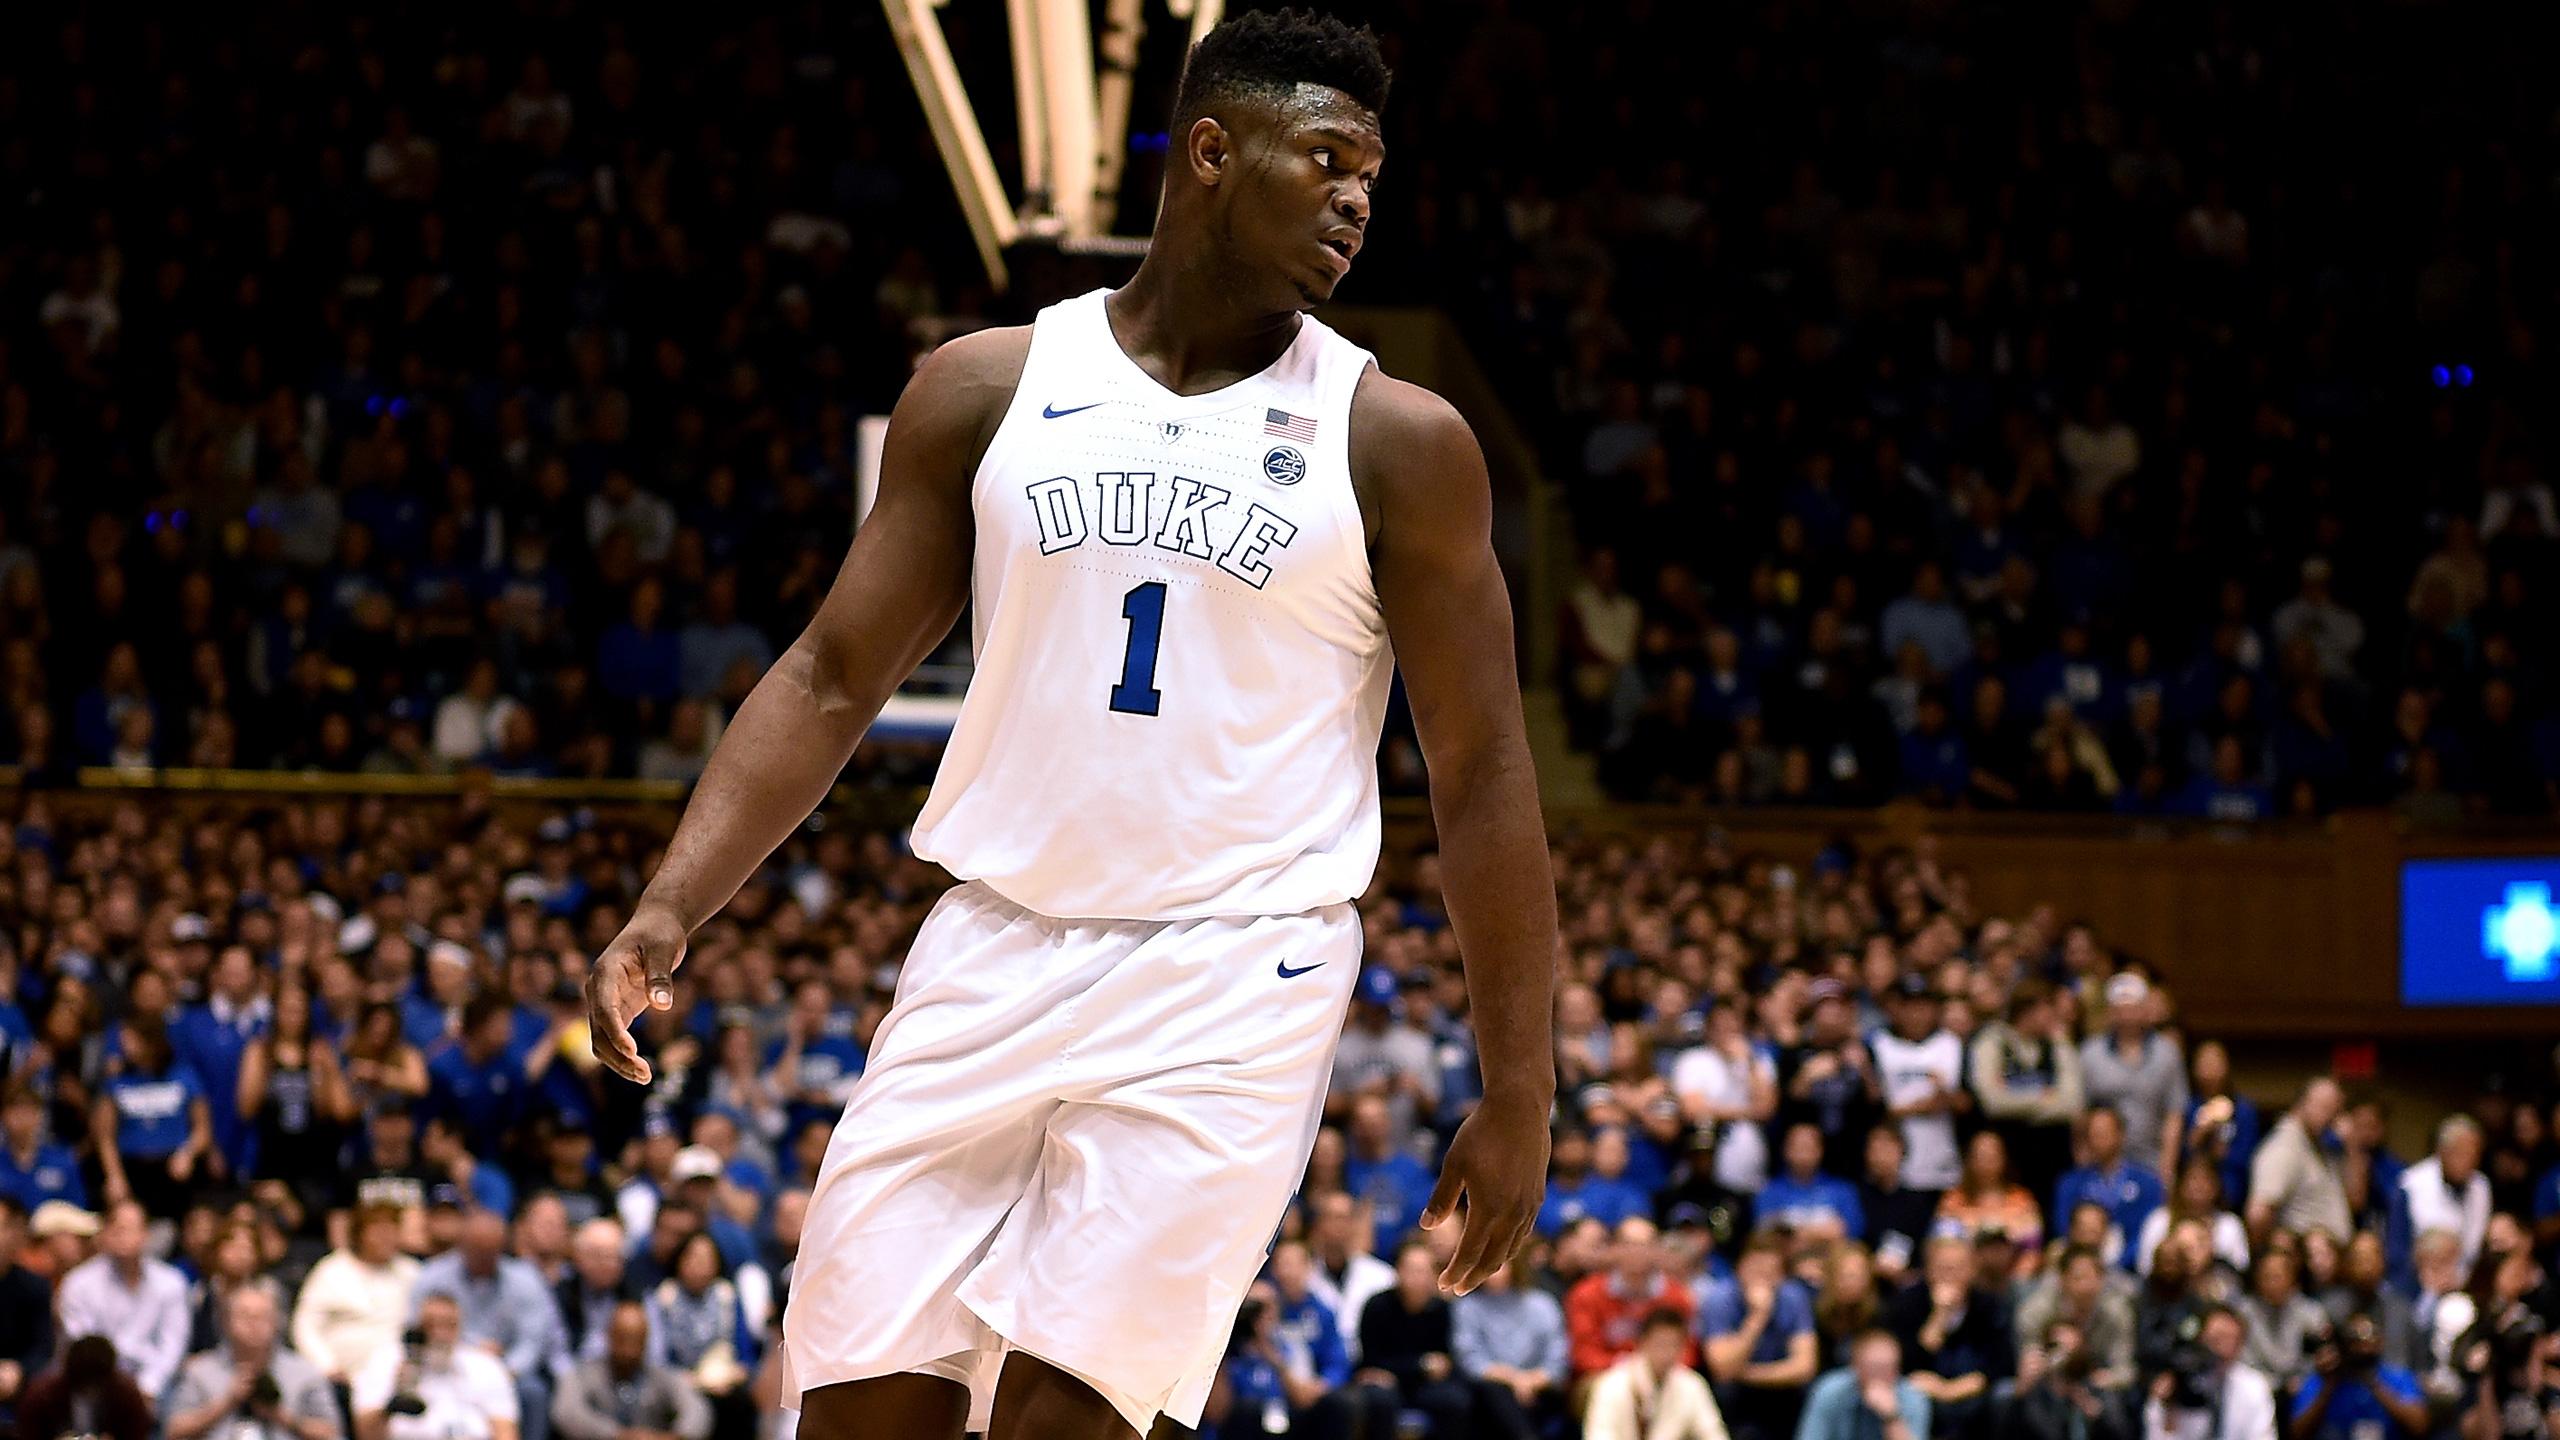 Boston College vs. #2 Duke (M Basketball)